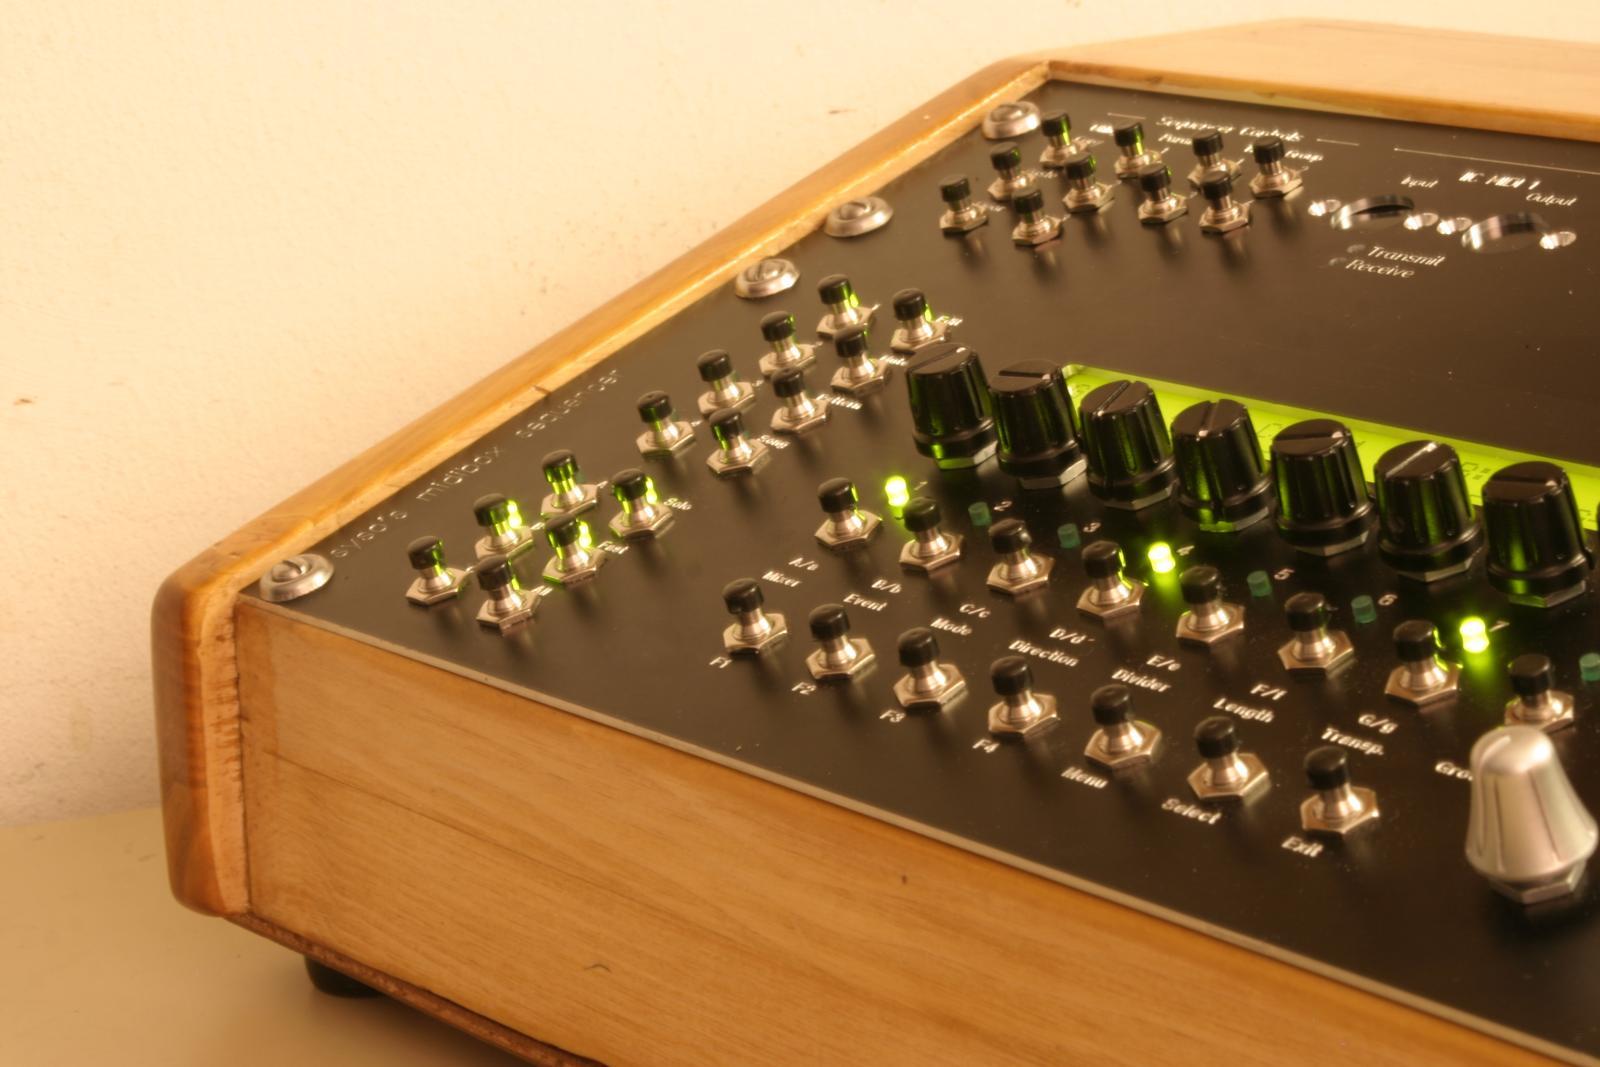 MIDIbox Seq finished